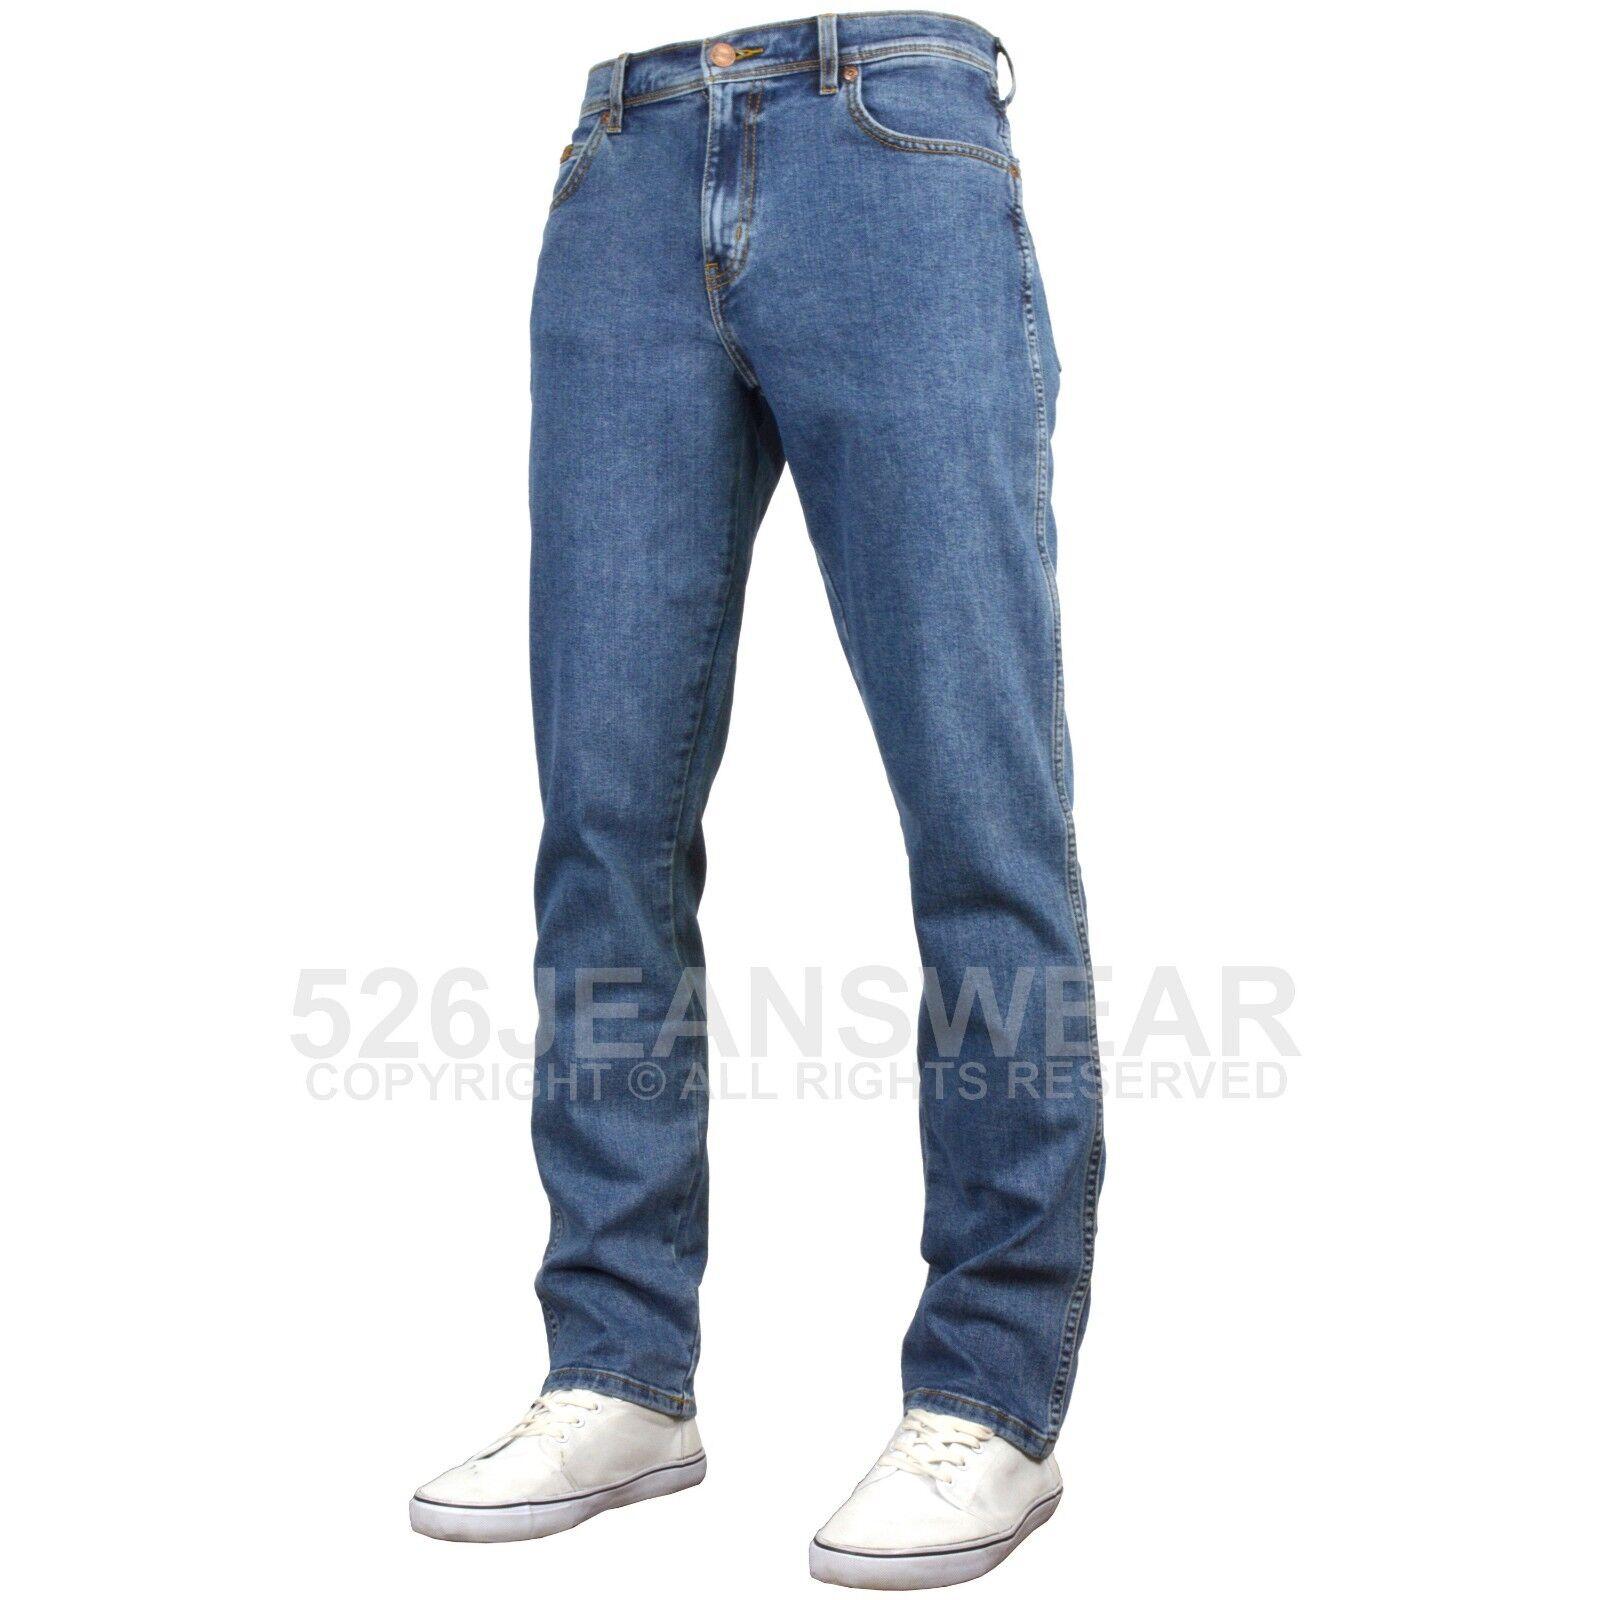 Wrangler Texas Stonewash Stretch Jeans Straight leg Waist 30 - 46